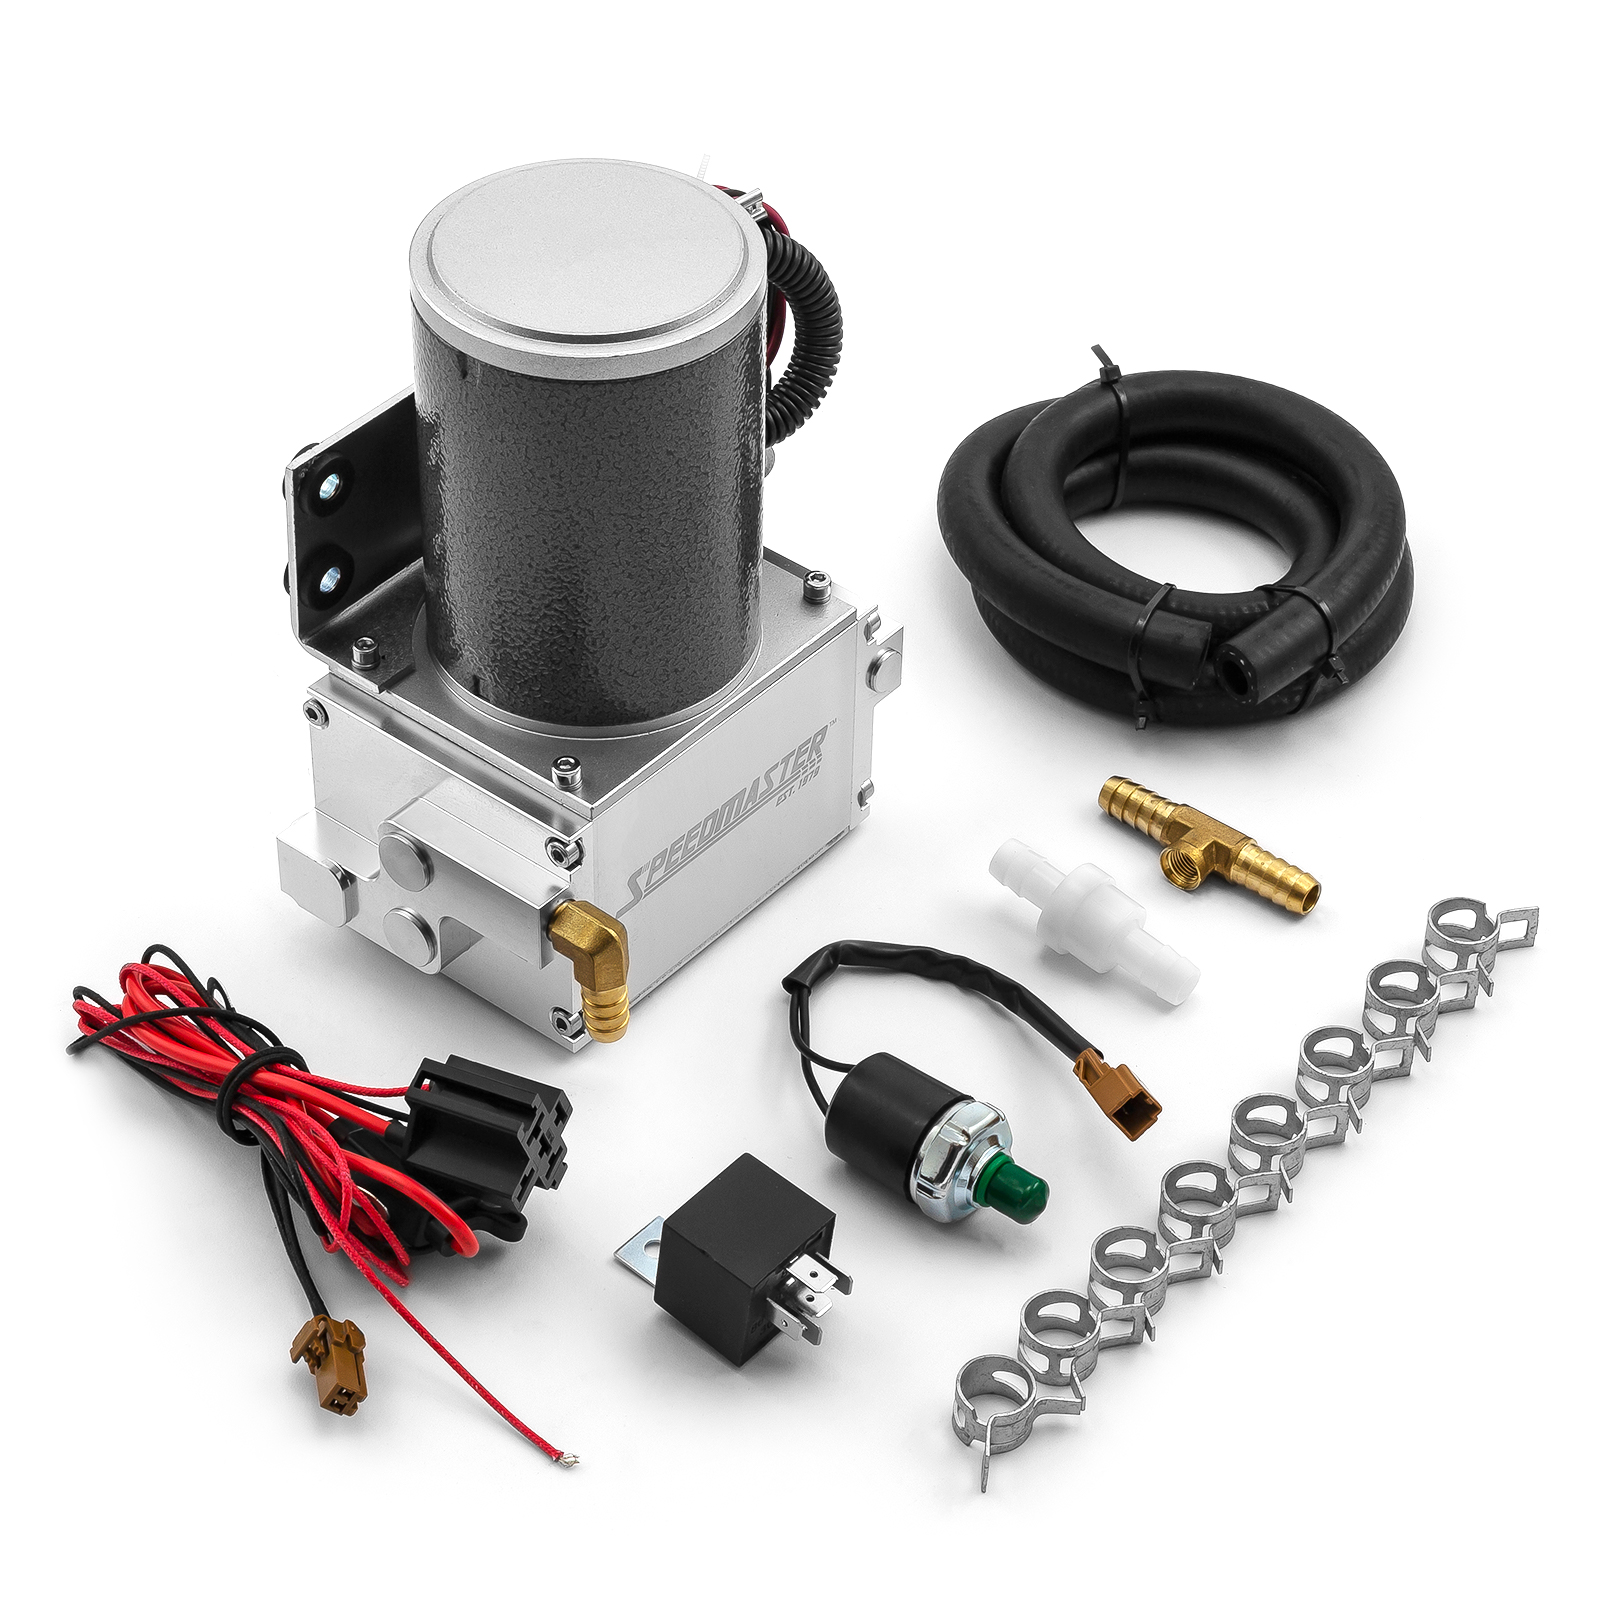 Universal Power Brake Booster 12V Electric Vacuum Pump Kit